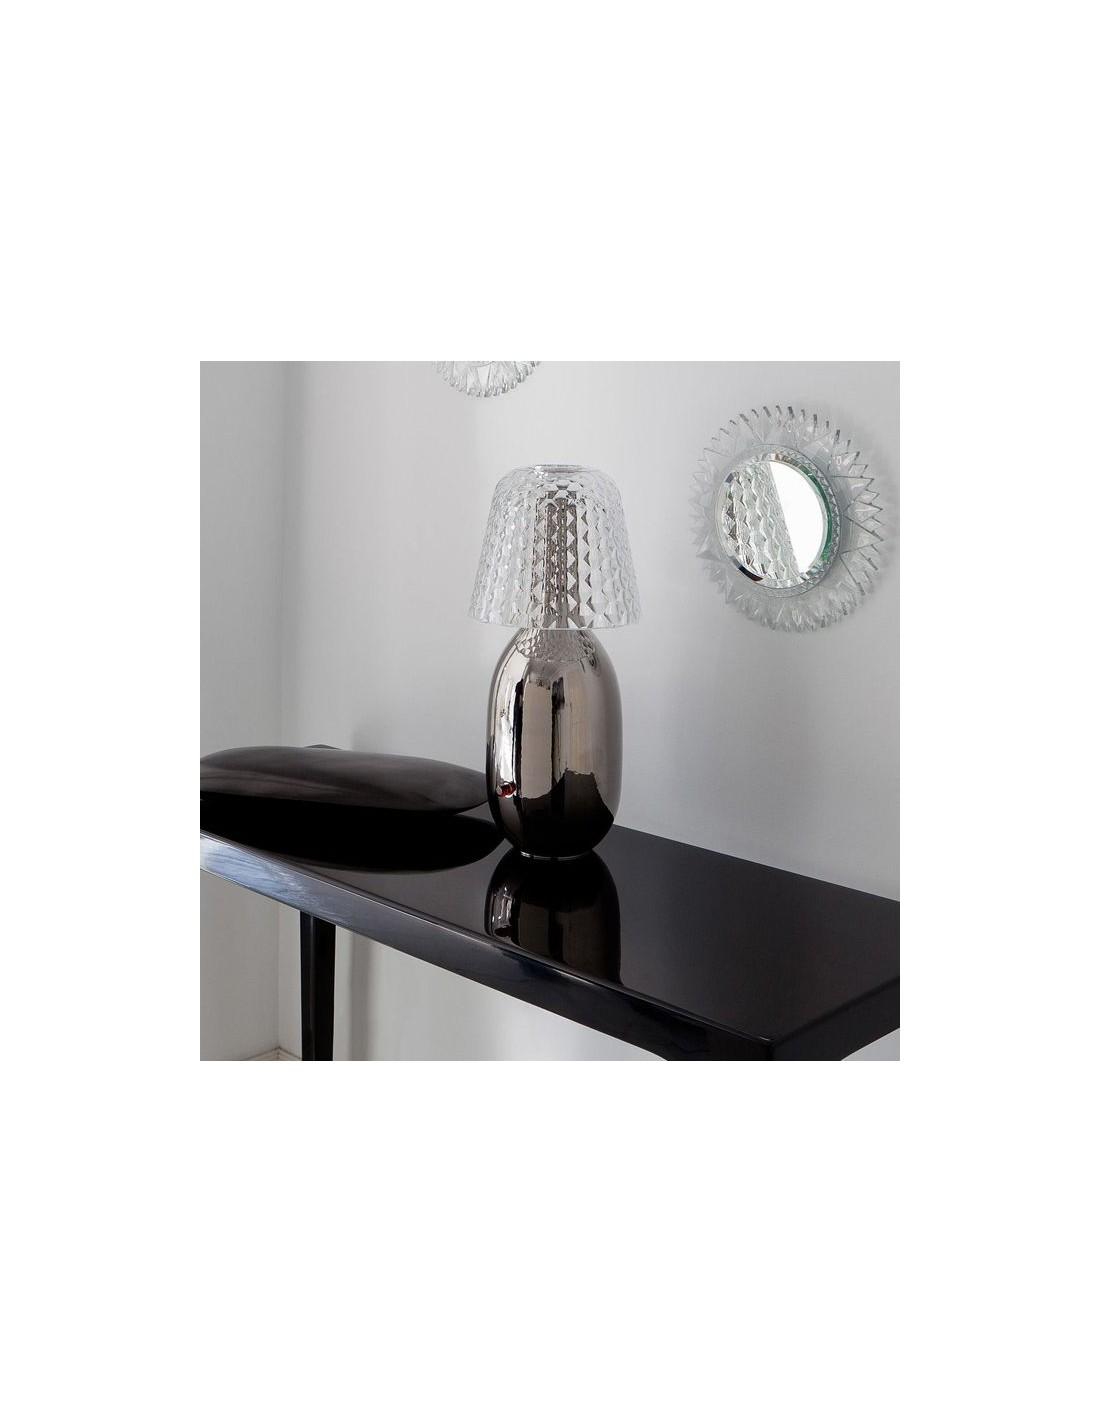 Lampe de table Candy Light de la marque Baccarat - Valente Design